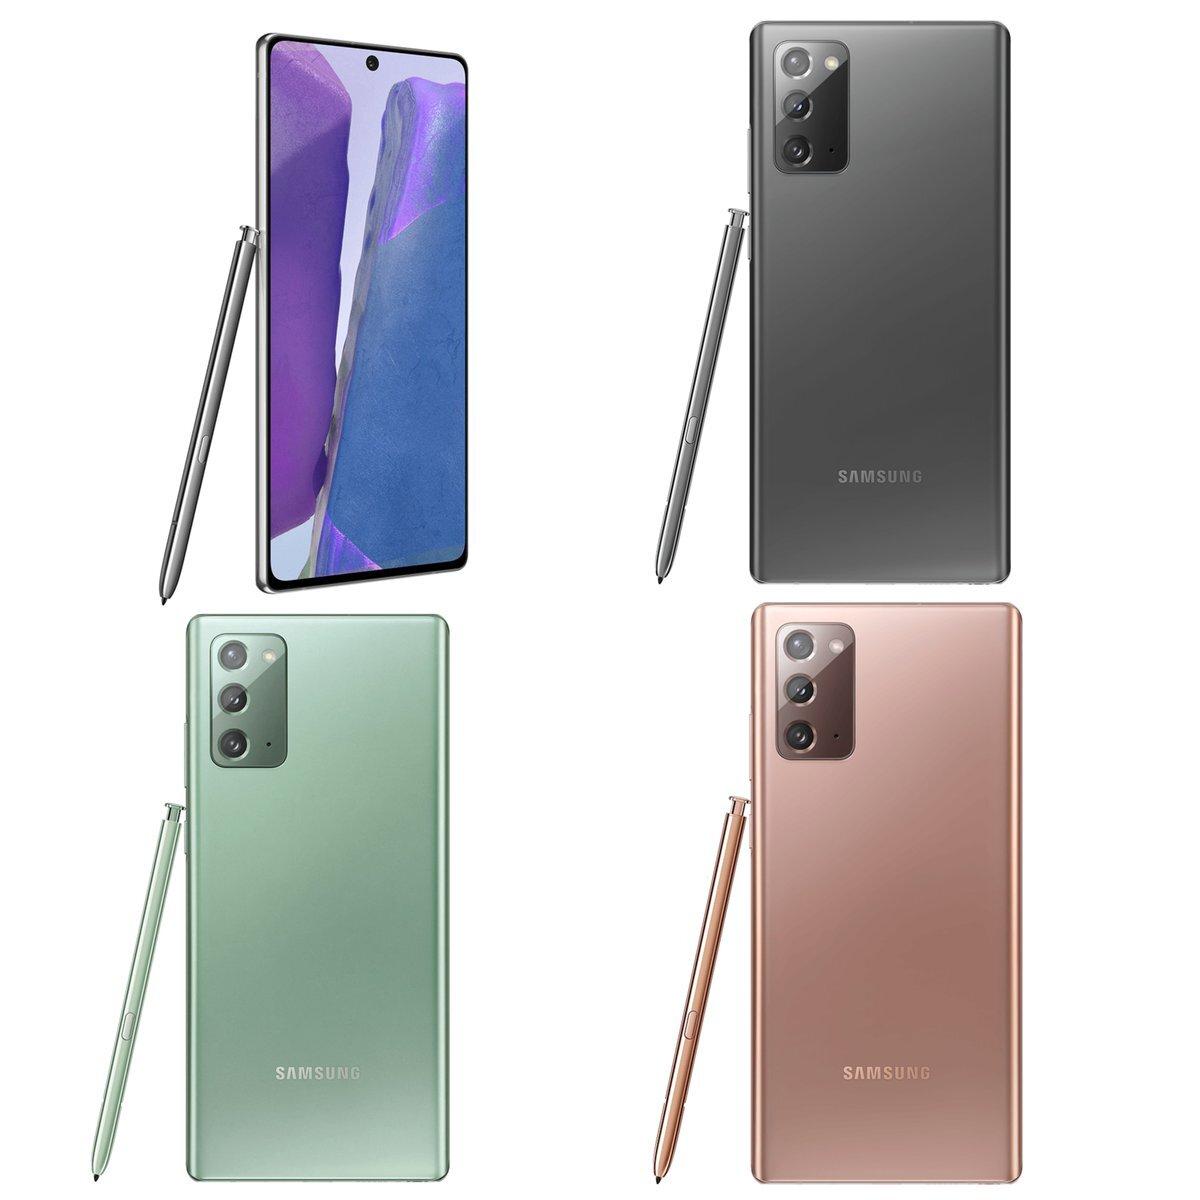 Galaxy Note20 range